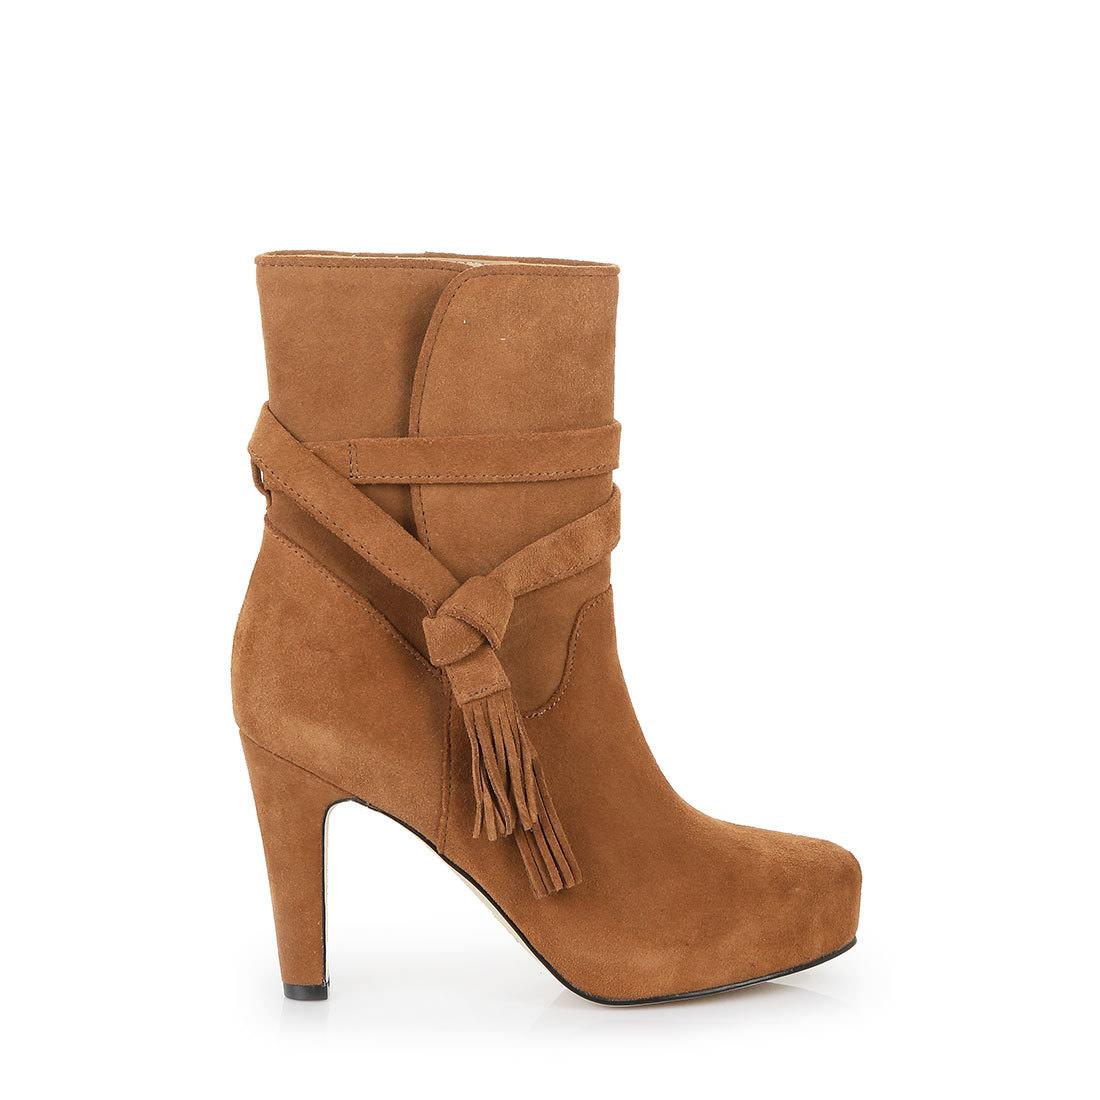 sports shoes 99f55 4652d Buffalo Plateau-Stiefelette in cognac aus Veloursleder ...